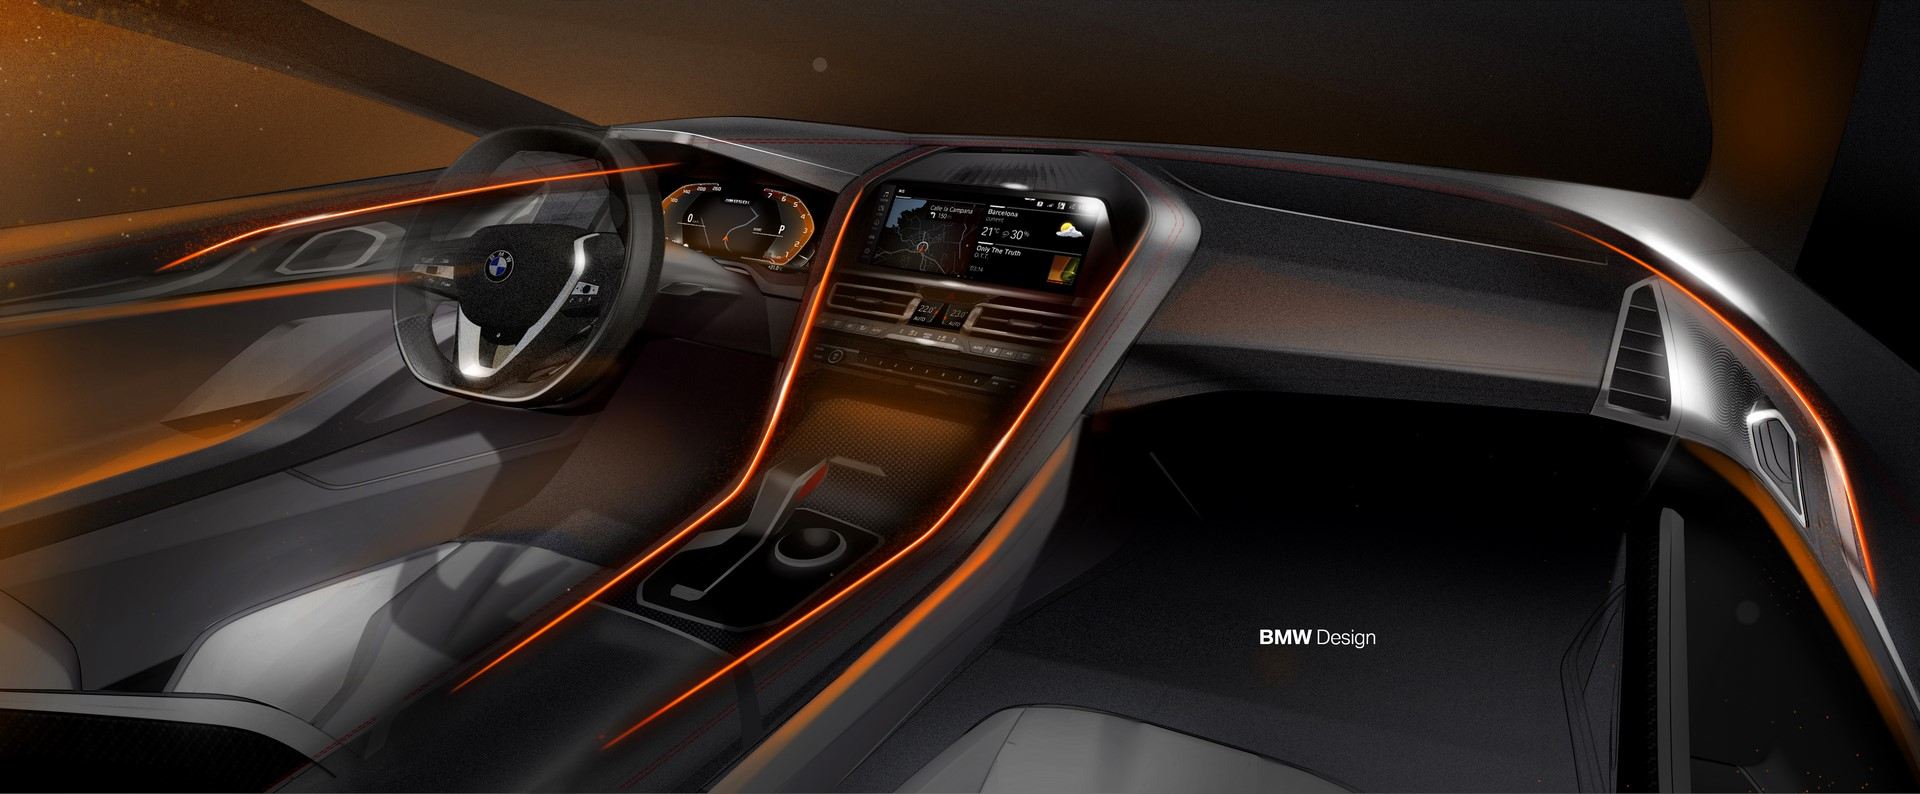 BMW 8-Series 2019 (47)